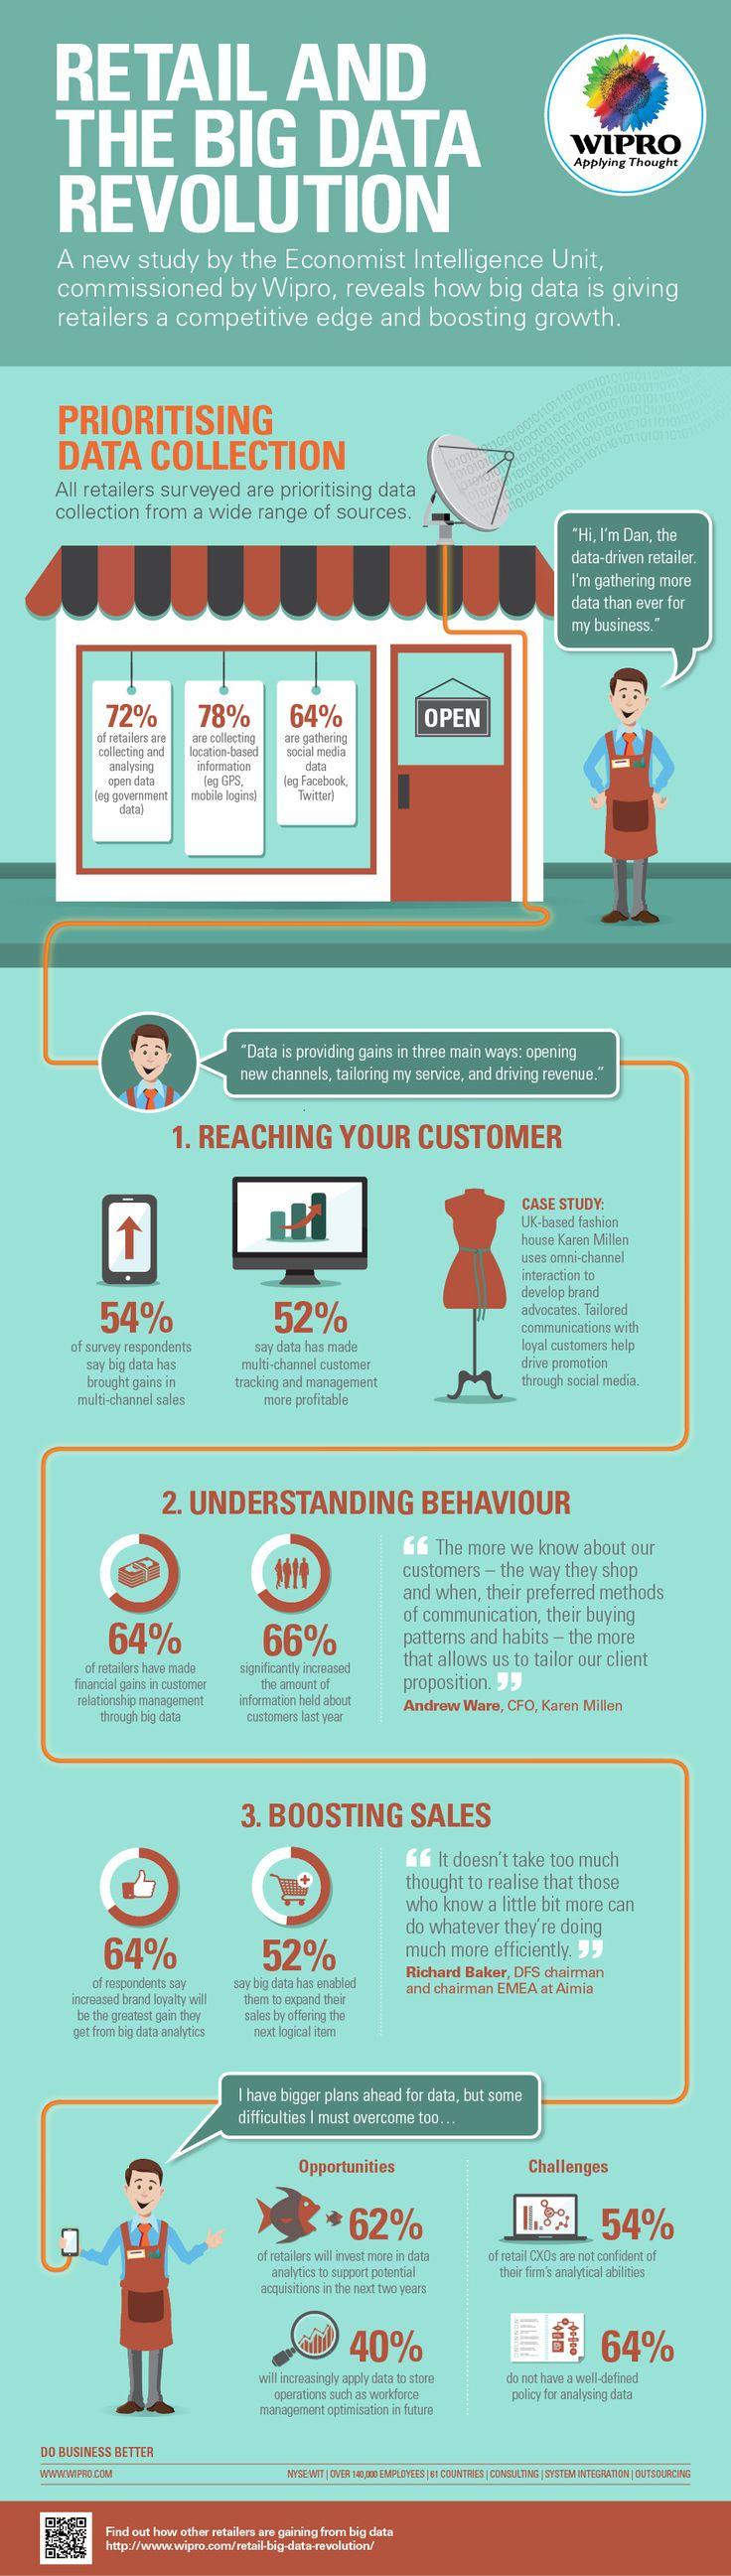 Retail And The Big Data Revolution   #Infographic #BigDataRevolution #CustomerService